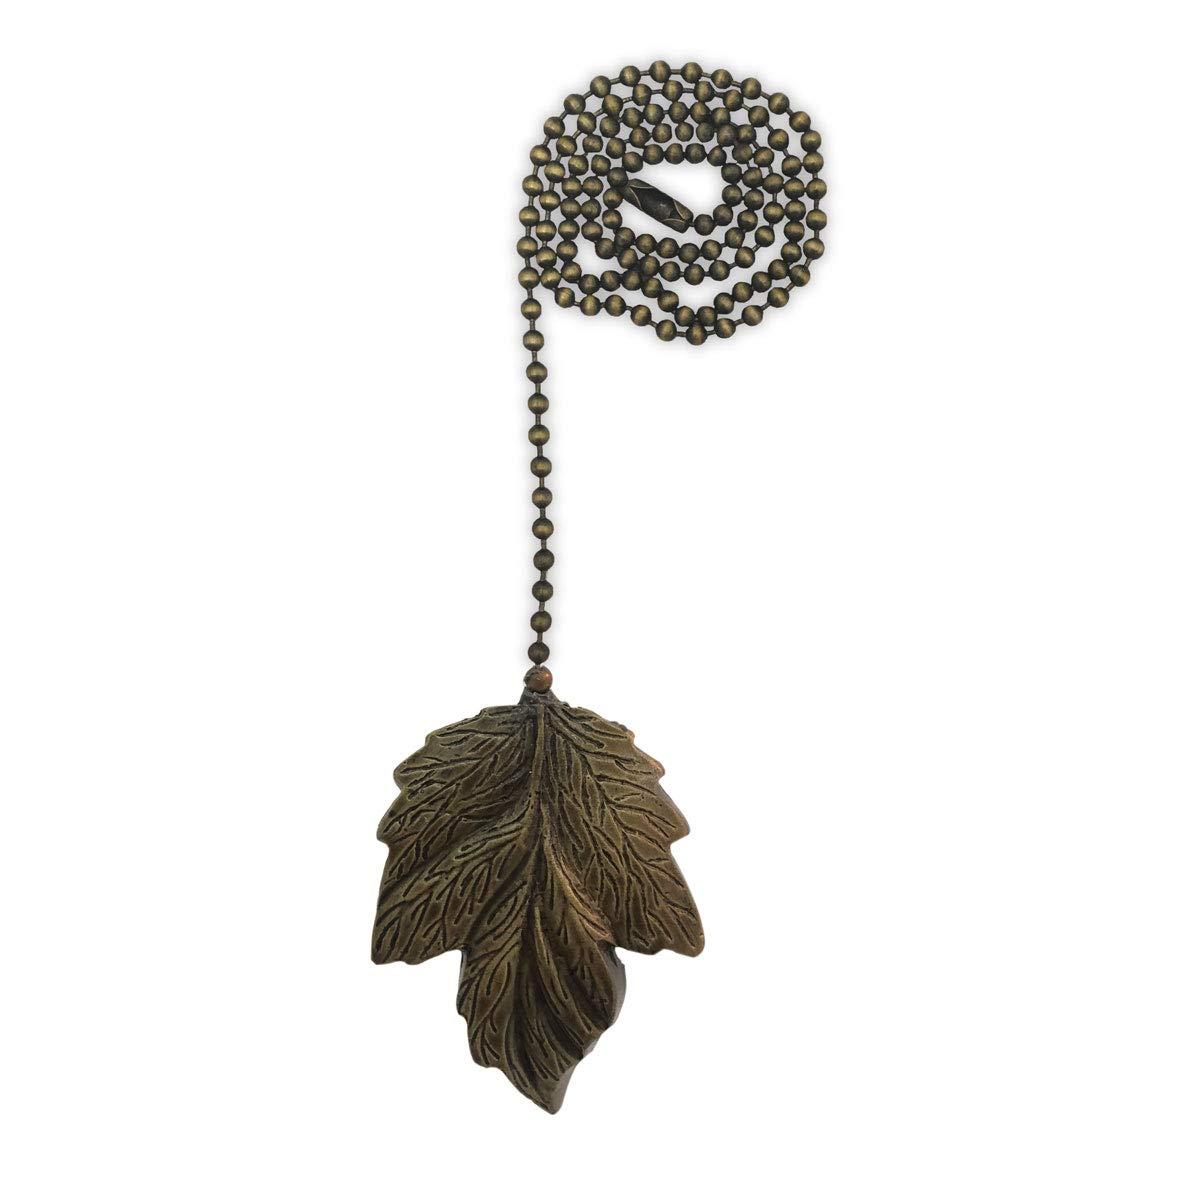 Royal Designs FP-1006AB-1 Leaf Design Fan Pull Chain, Antique Brass by Royal Designs, Inc